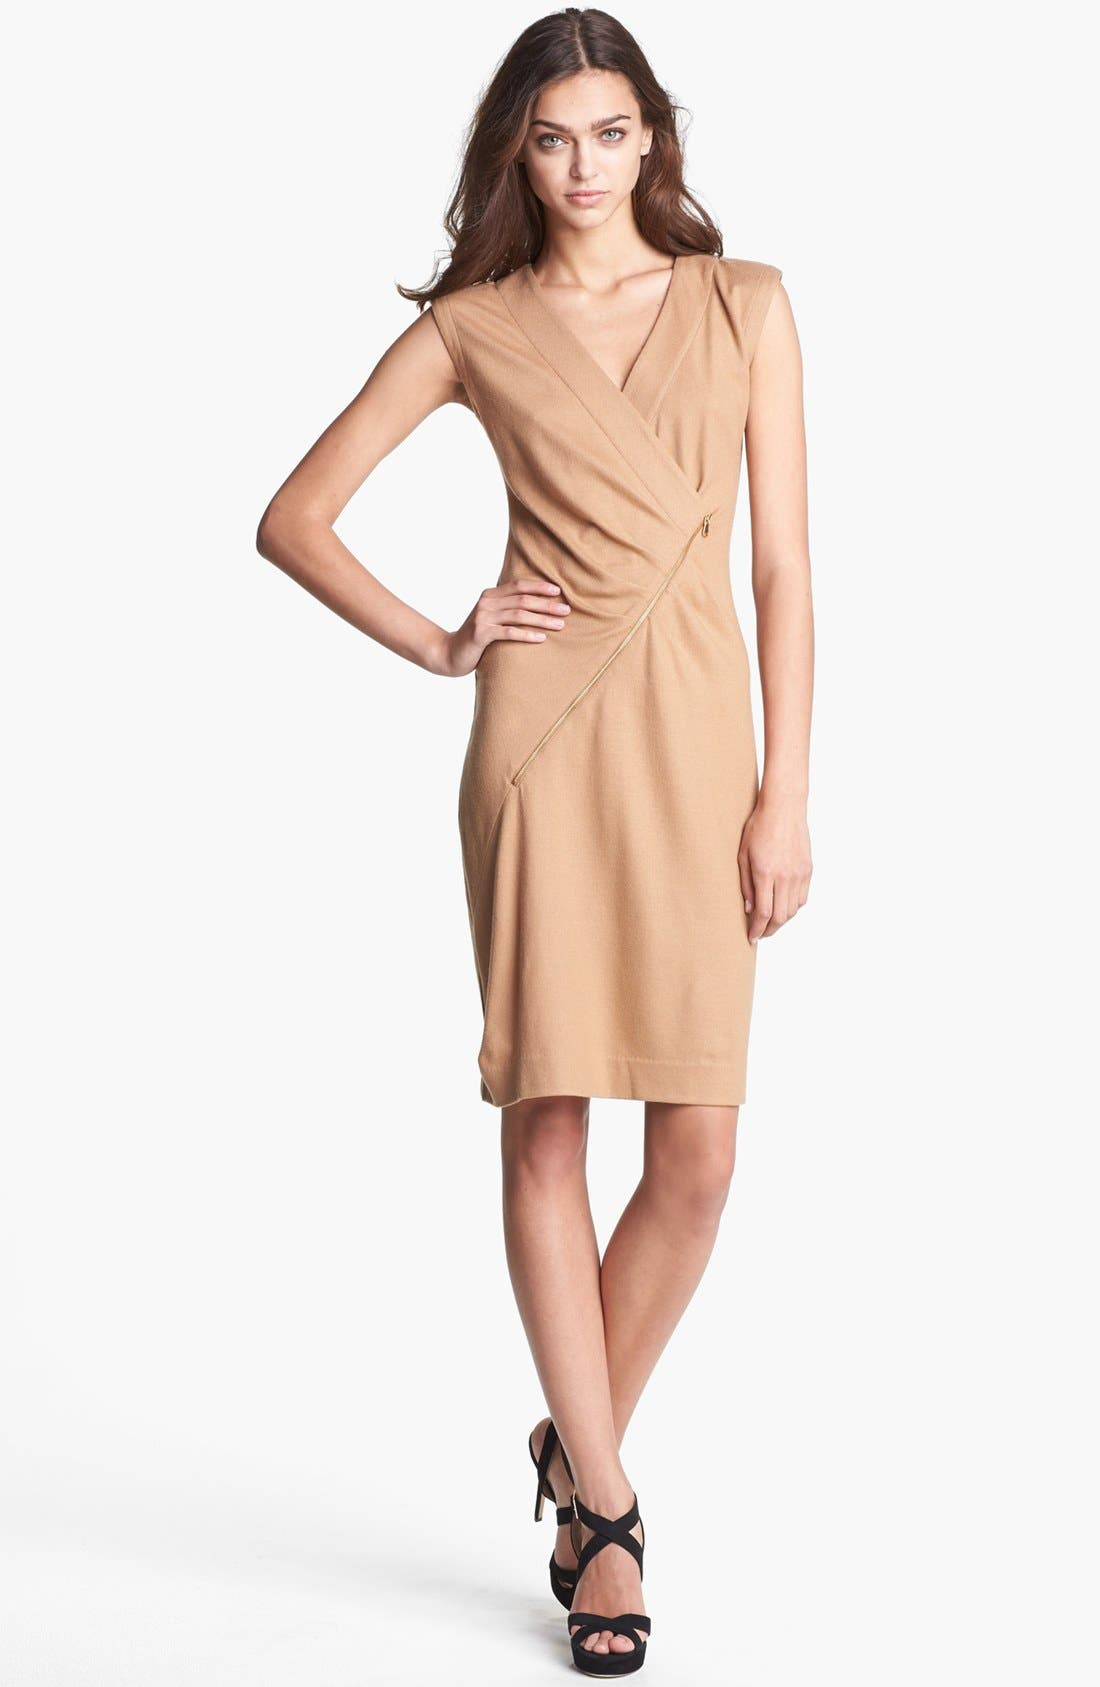 Main Image - MARC BY MARC JACOBS 'Mercedes' Wool Sheath Dress